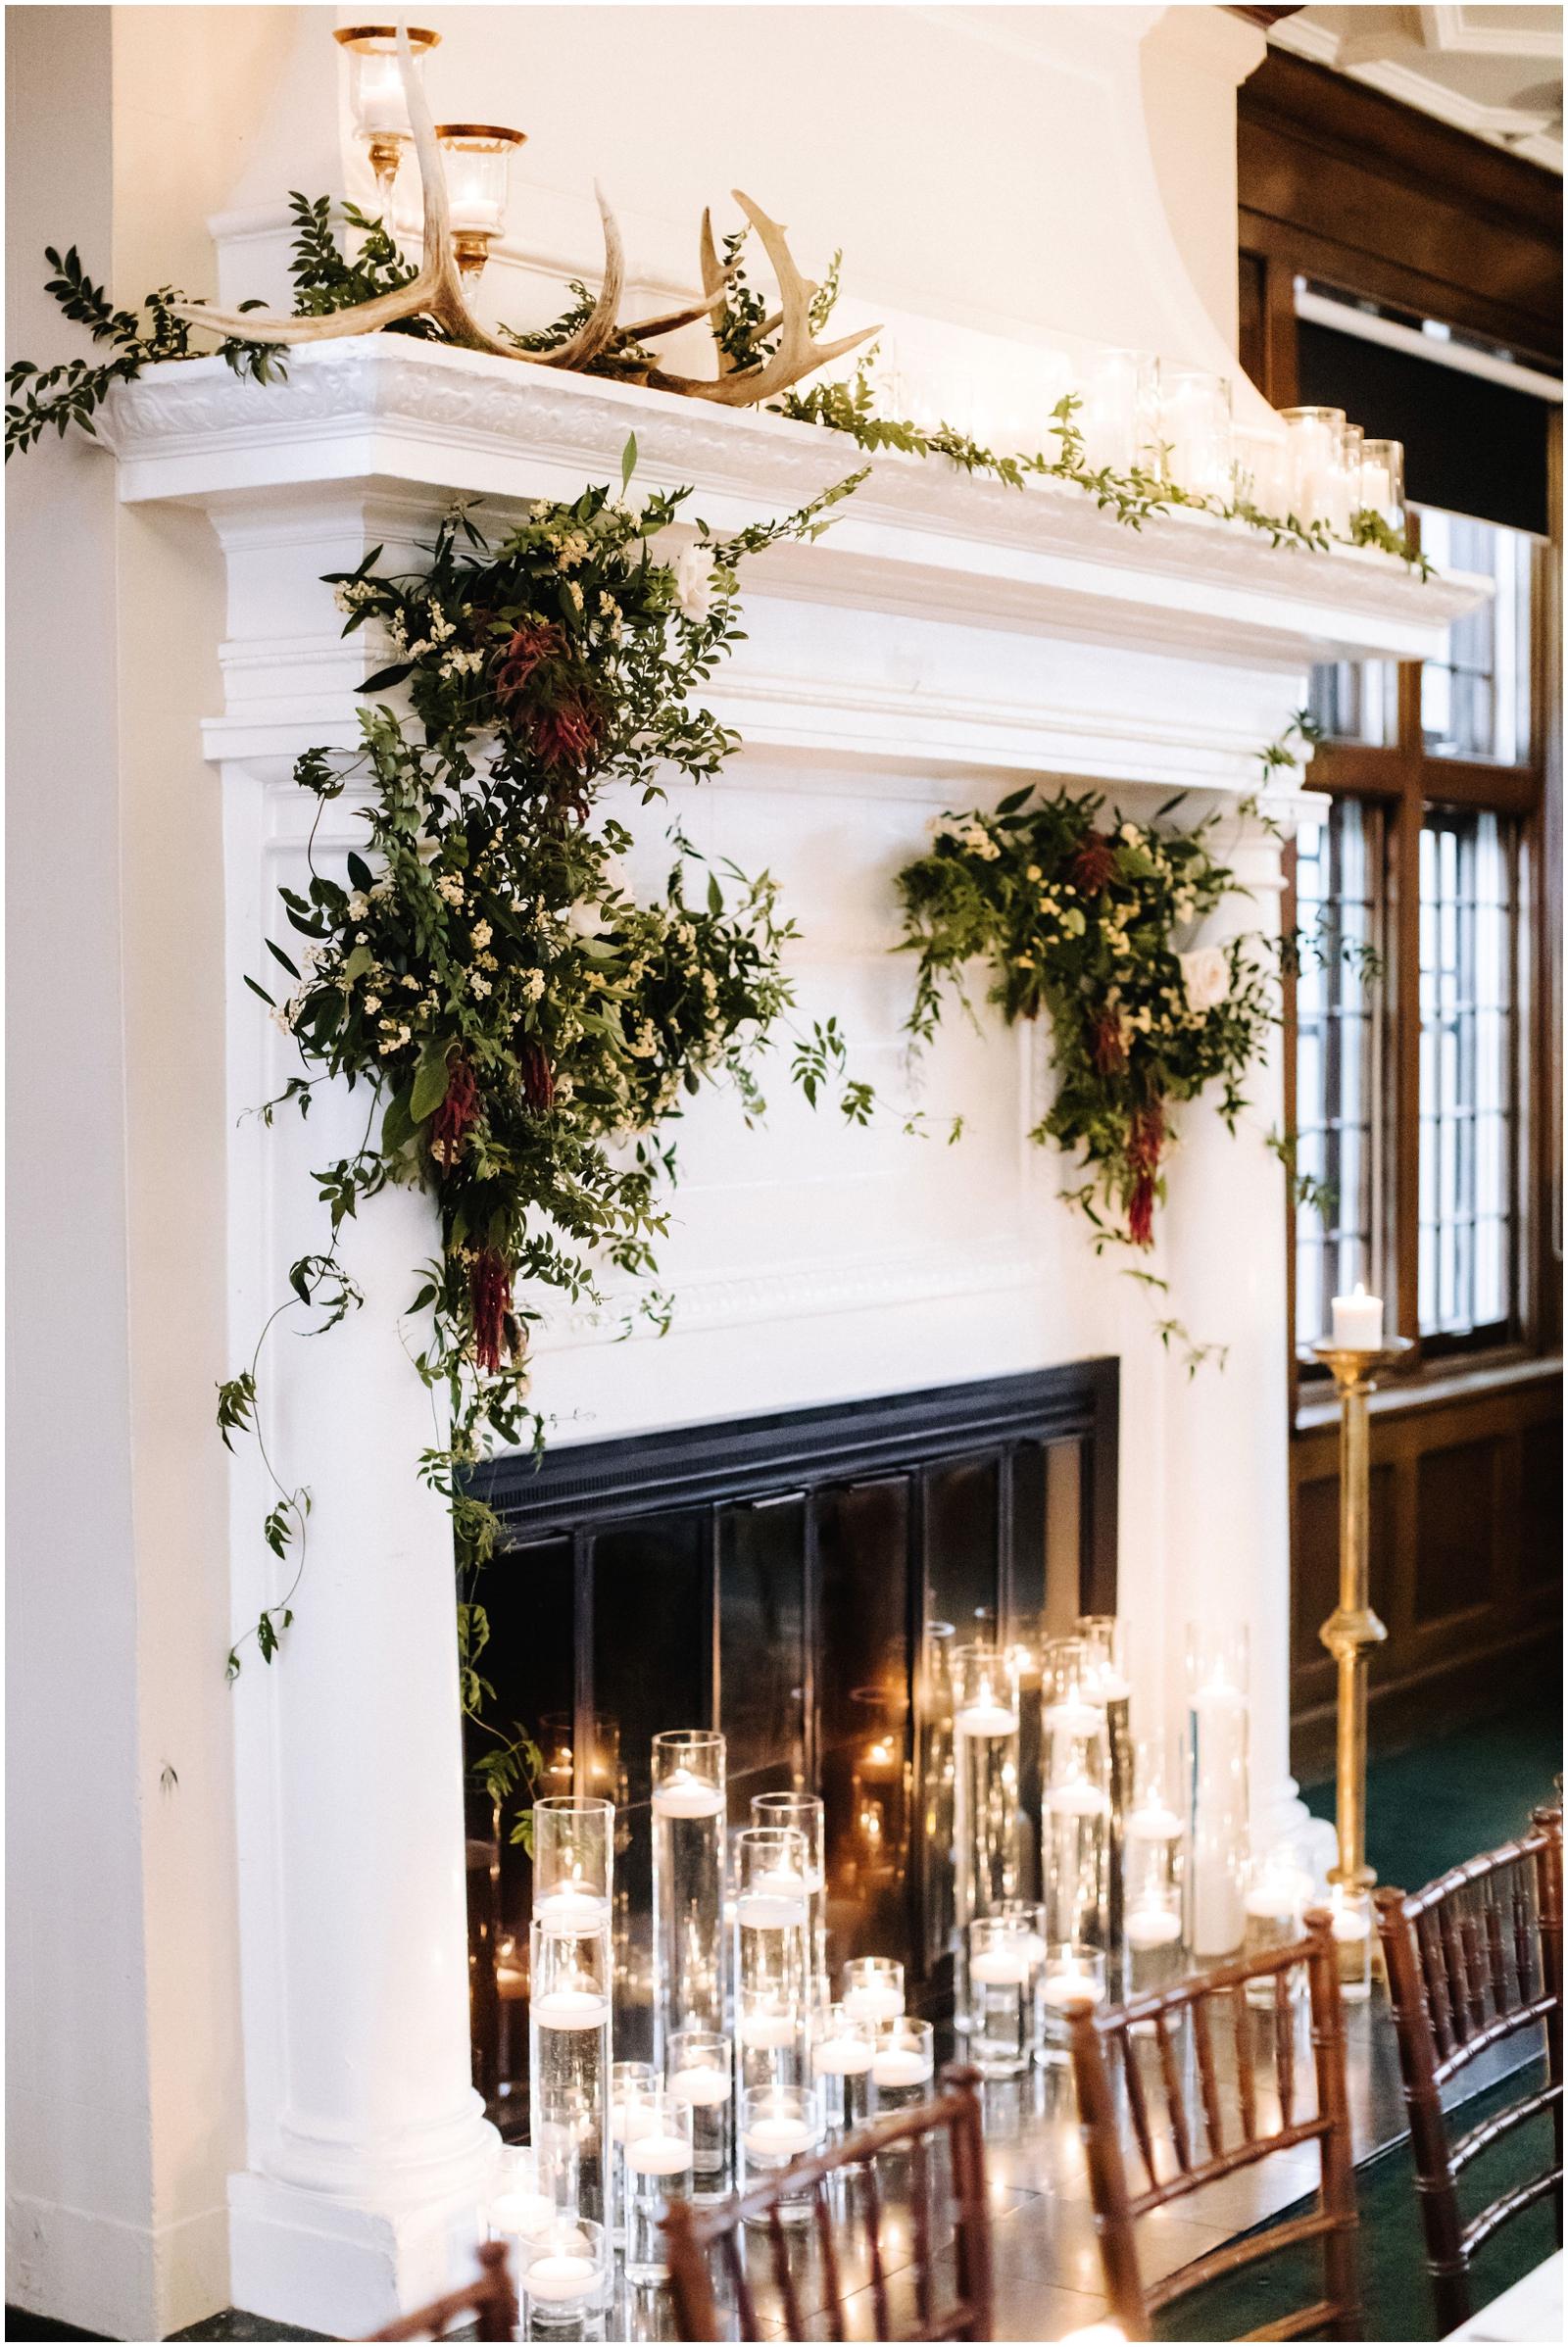 Minnesota Wedding Planner, Mpls Wedding Planner, Machine Shop MPLS, Mpls Wedding Venue . Greenery wedding reception decor